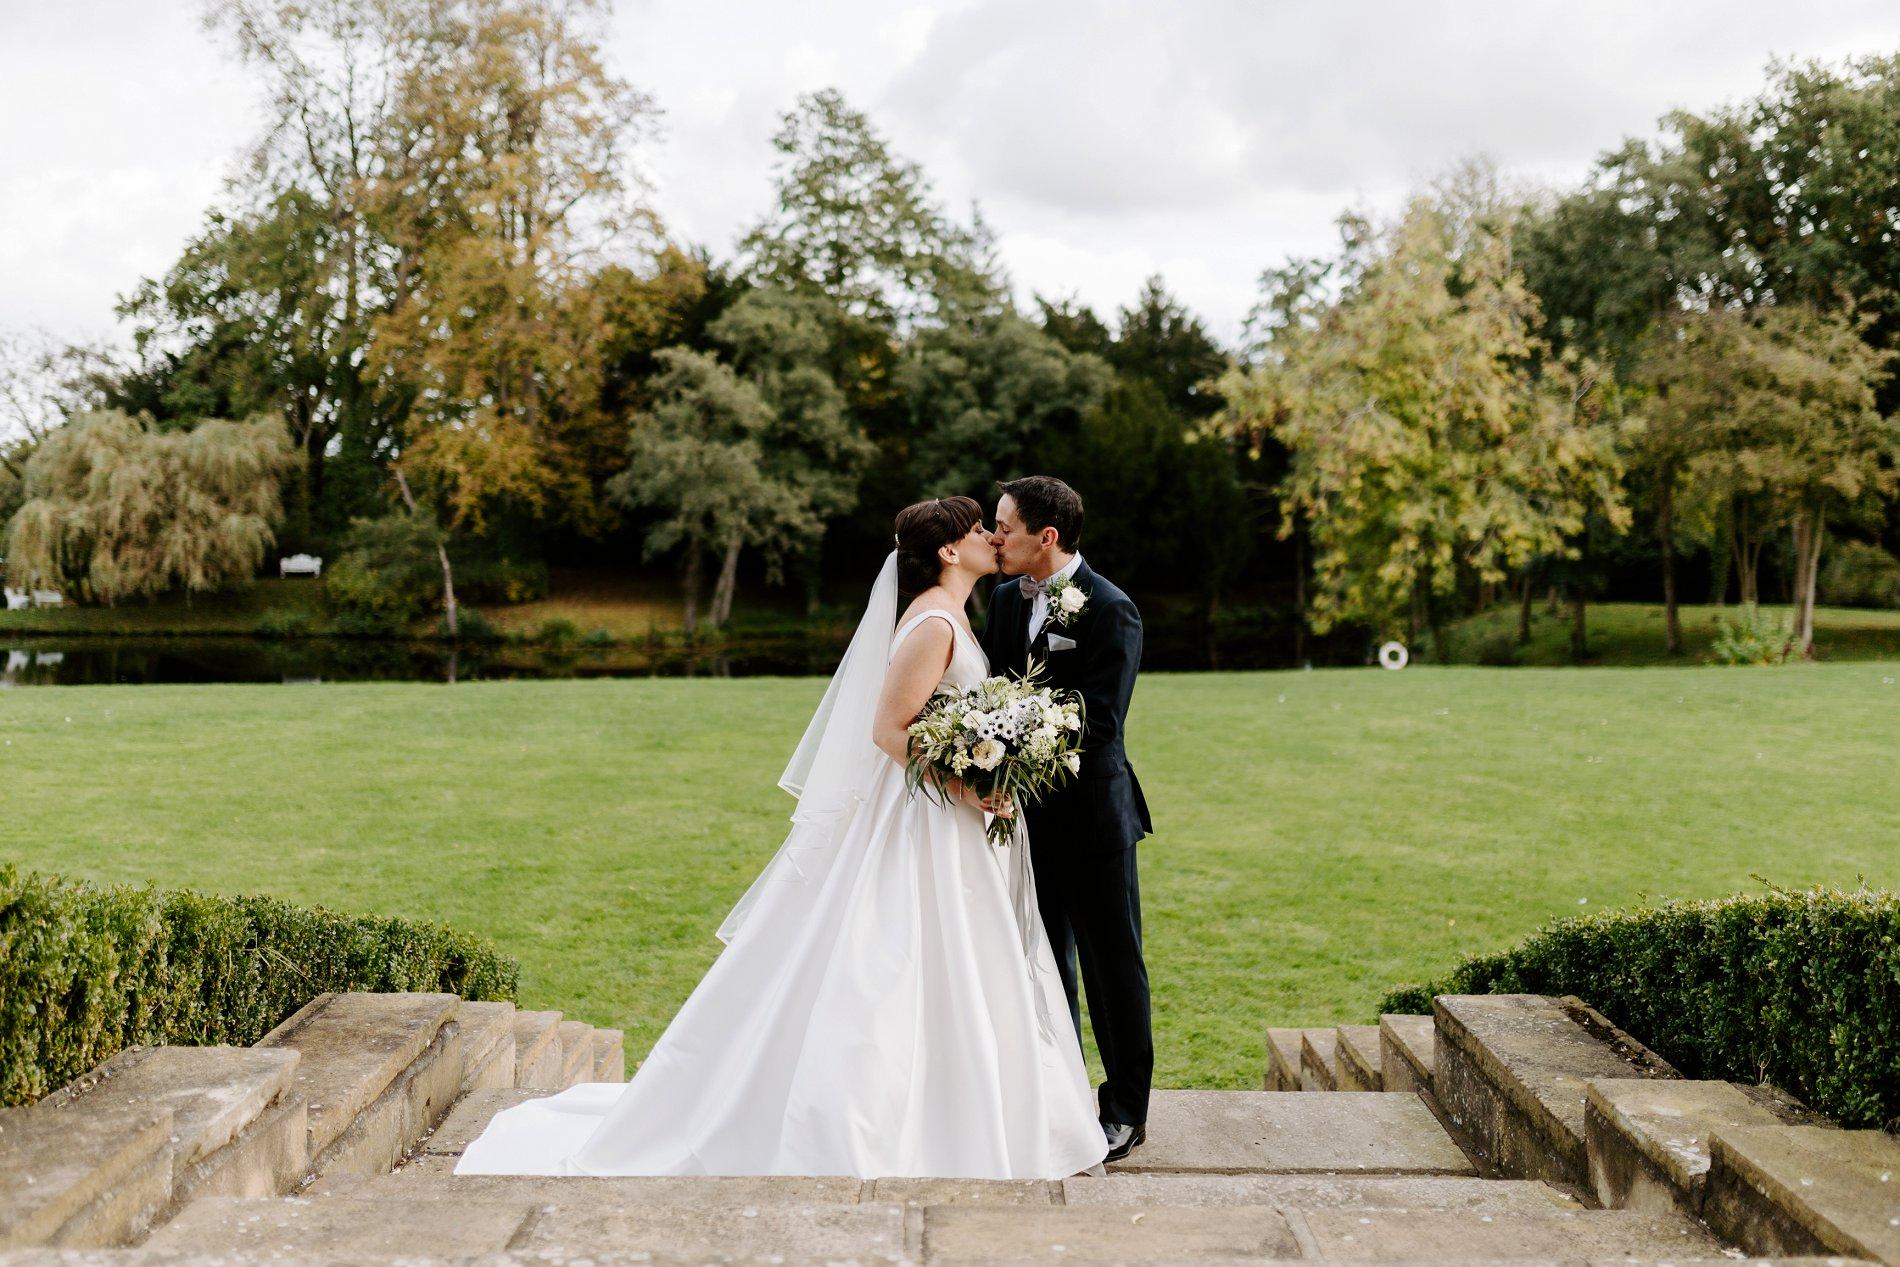 An Elegant White Wedding at Thicket Priory (c) Carla Whittingham Photography (43)